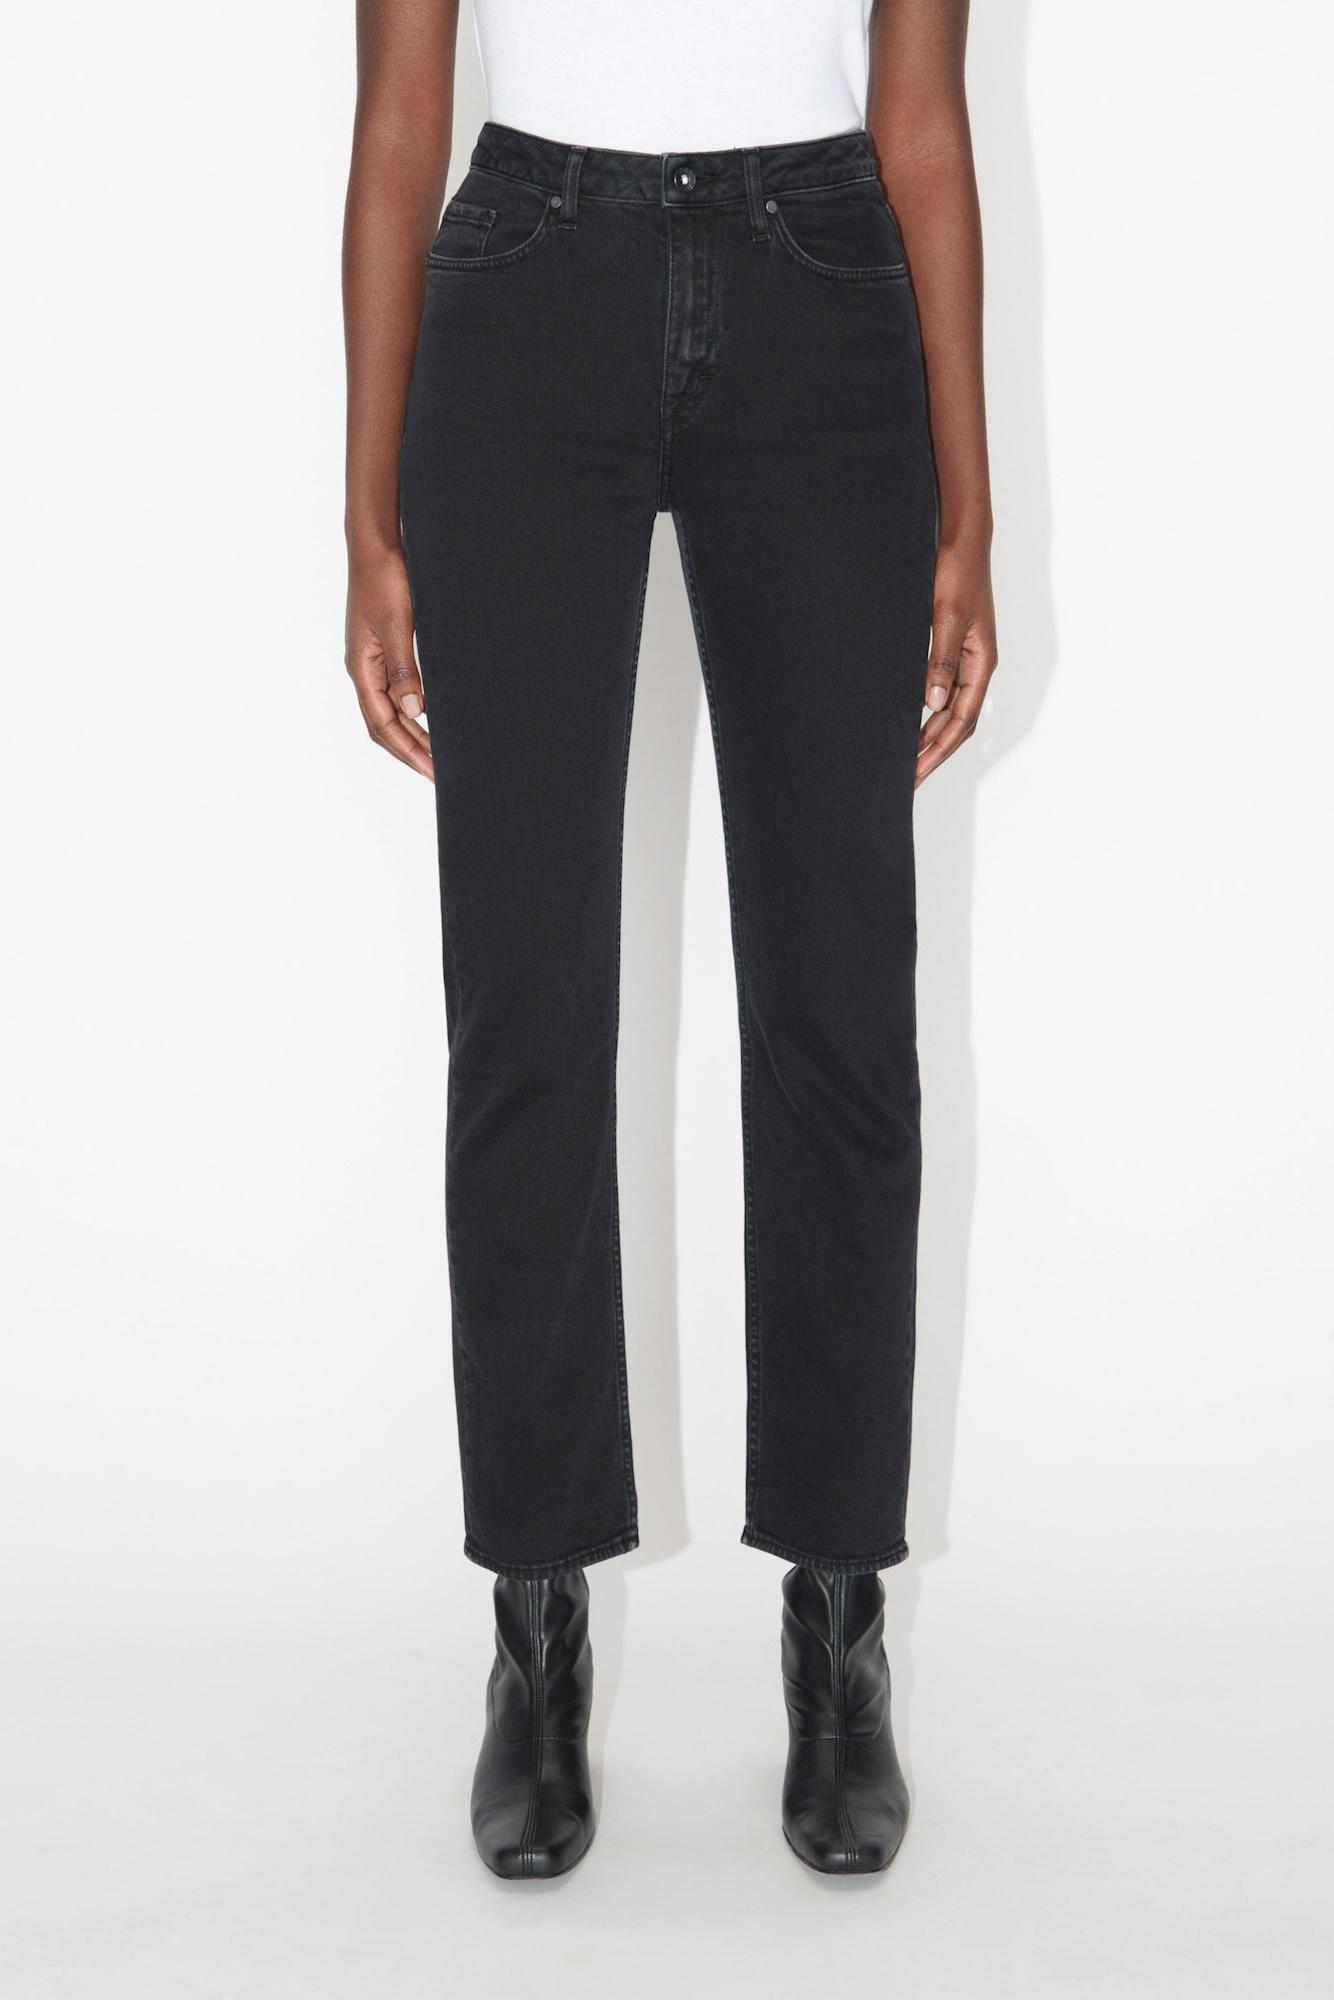 Meg Jeans - Black-2